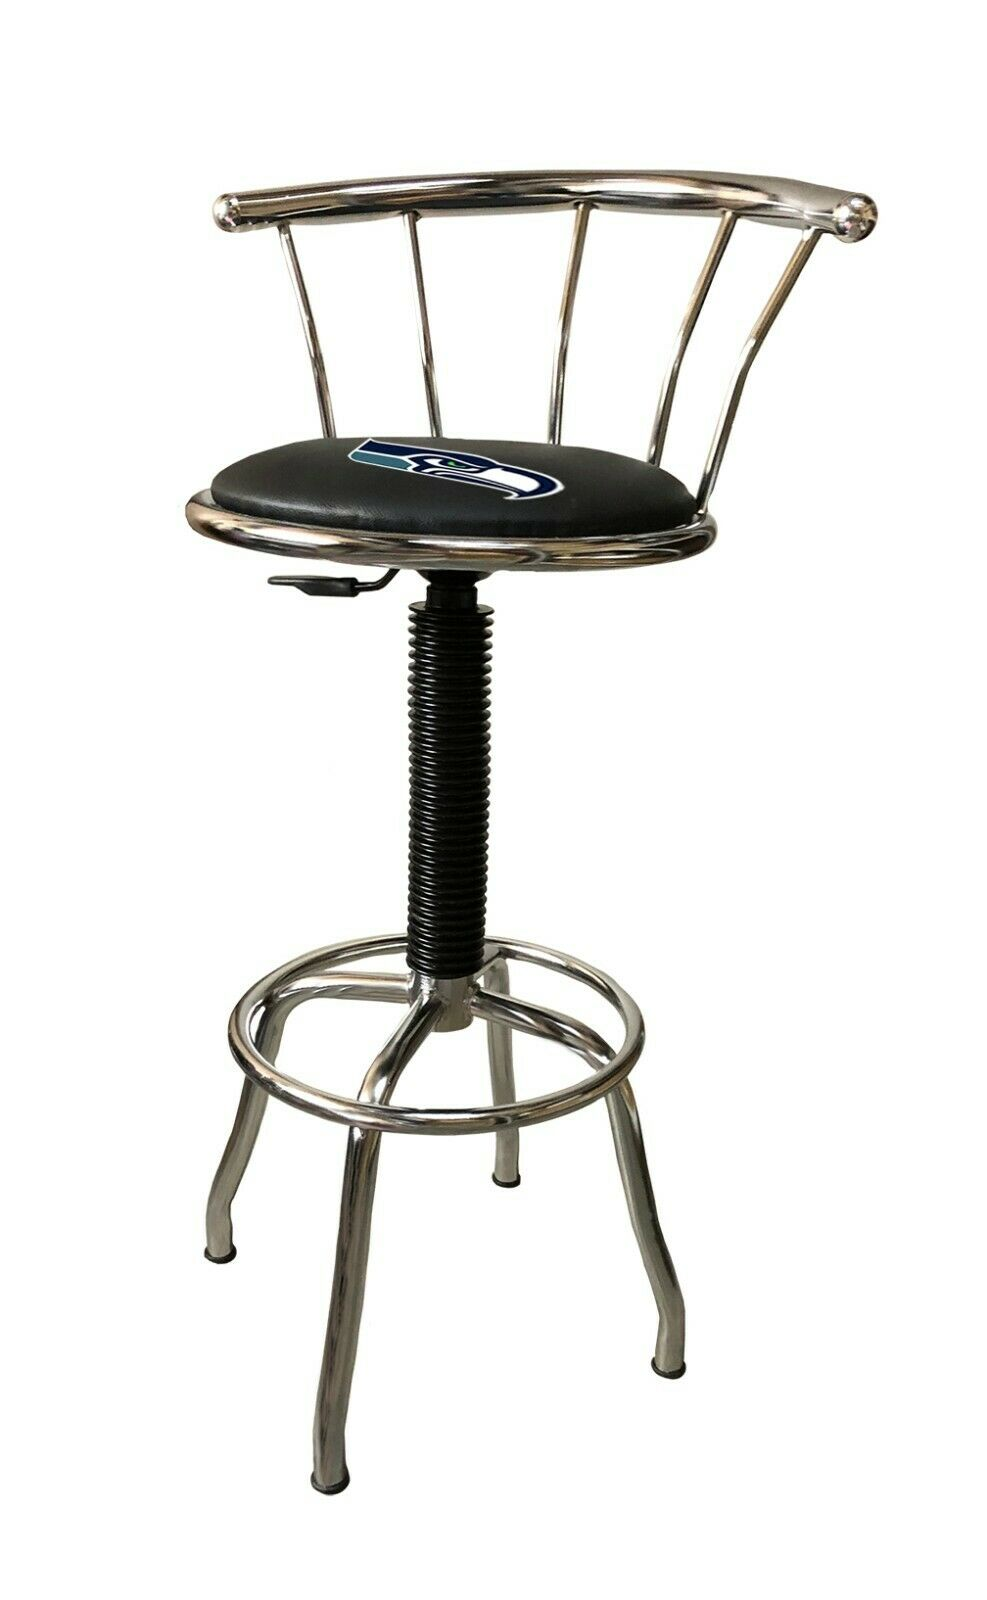 nfl chrome metal bar stool 25 to